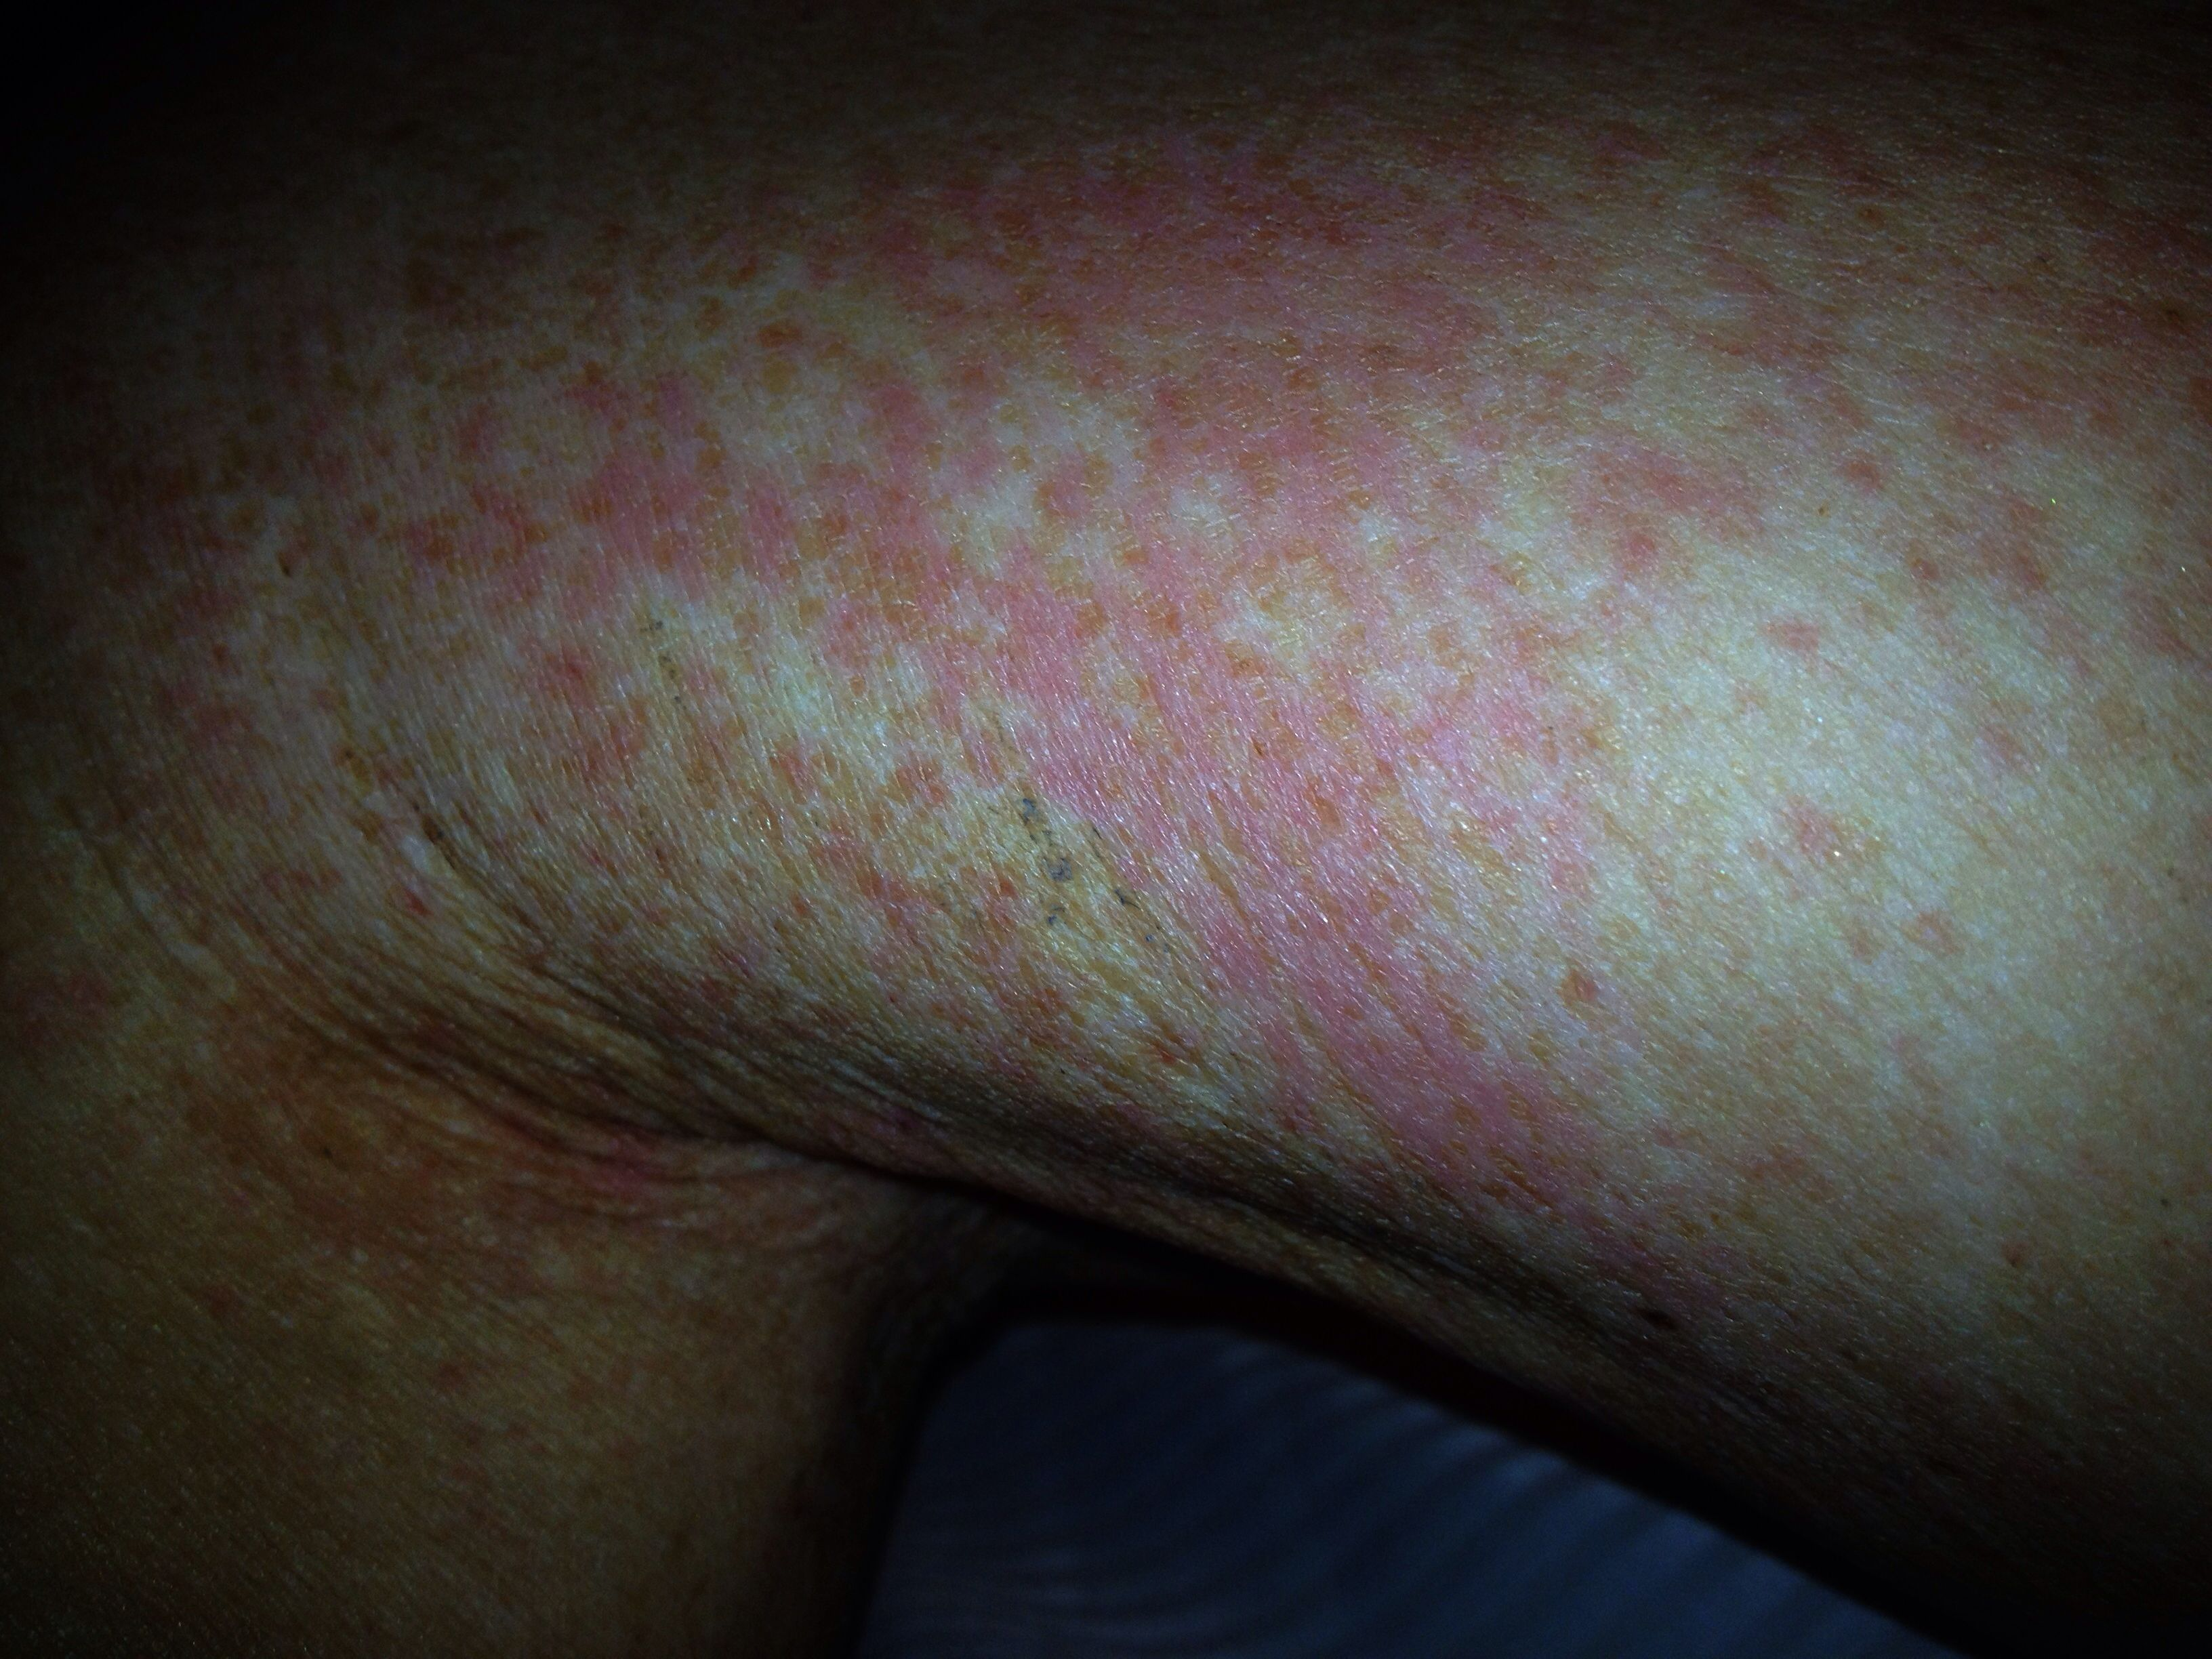 Rash - definition of rash by The Free Dictionary